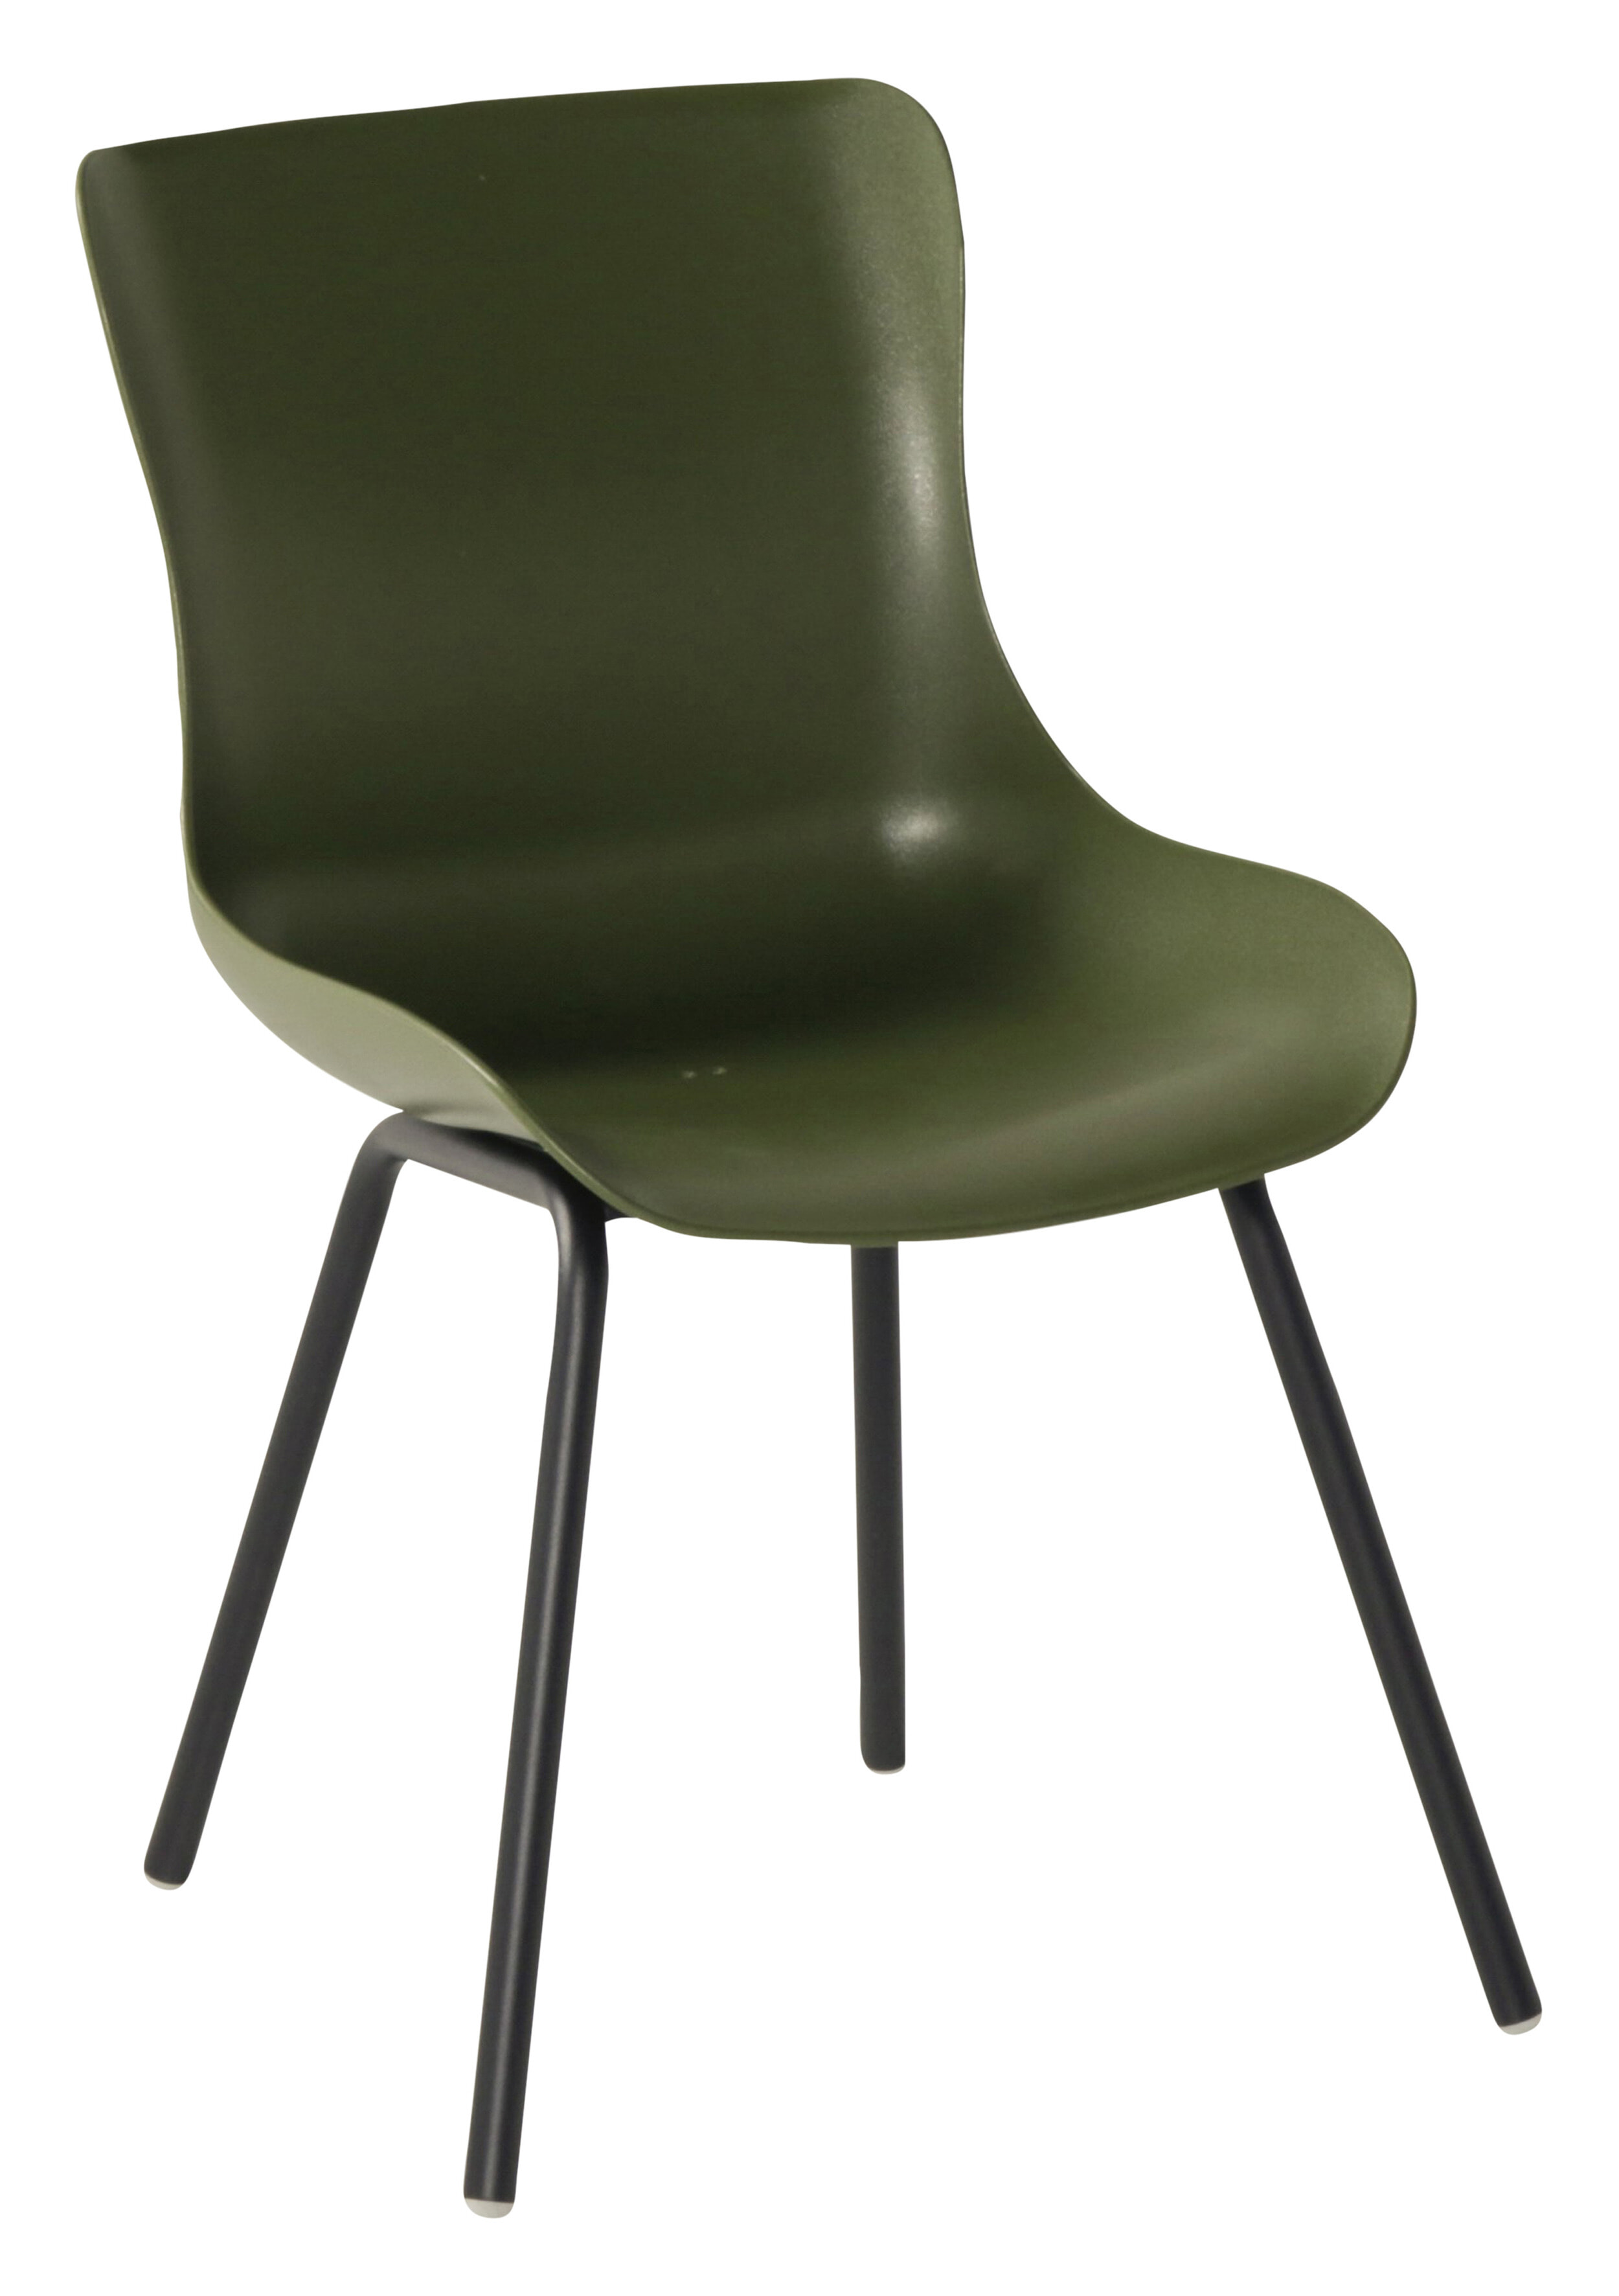 Hartman Tuinstoel 'Sophie Rondo', kleur Groen